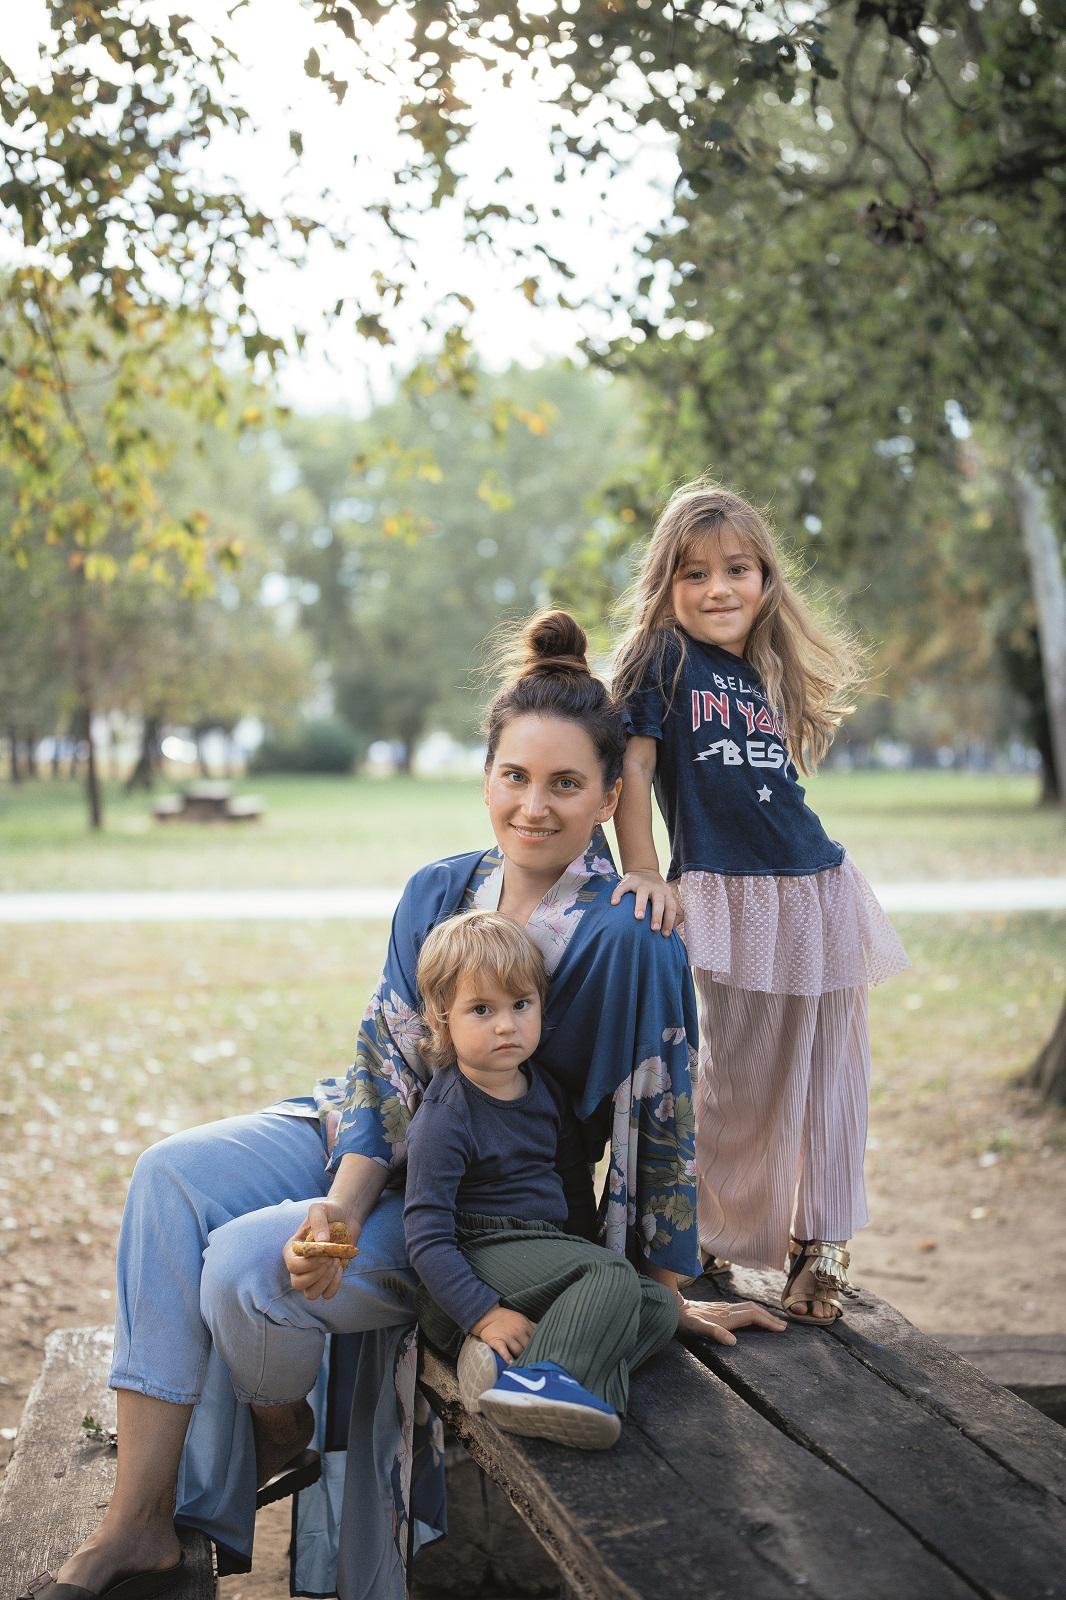 zagreb 22.09.2020 nastasja mama i kcerke gaia i mala reia petric foto vedran peteh